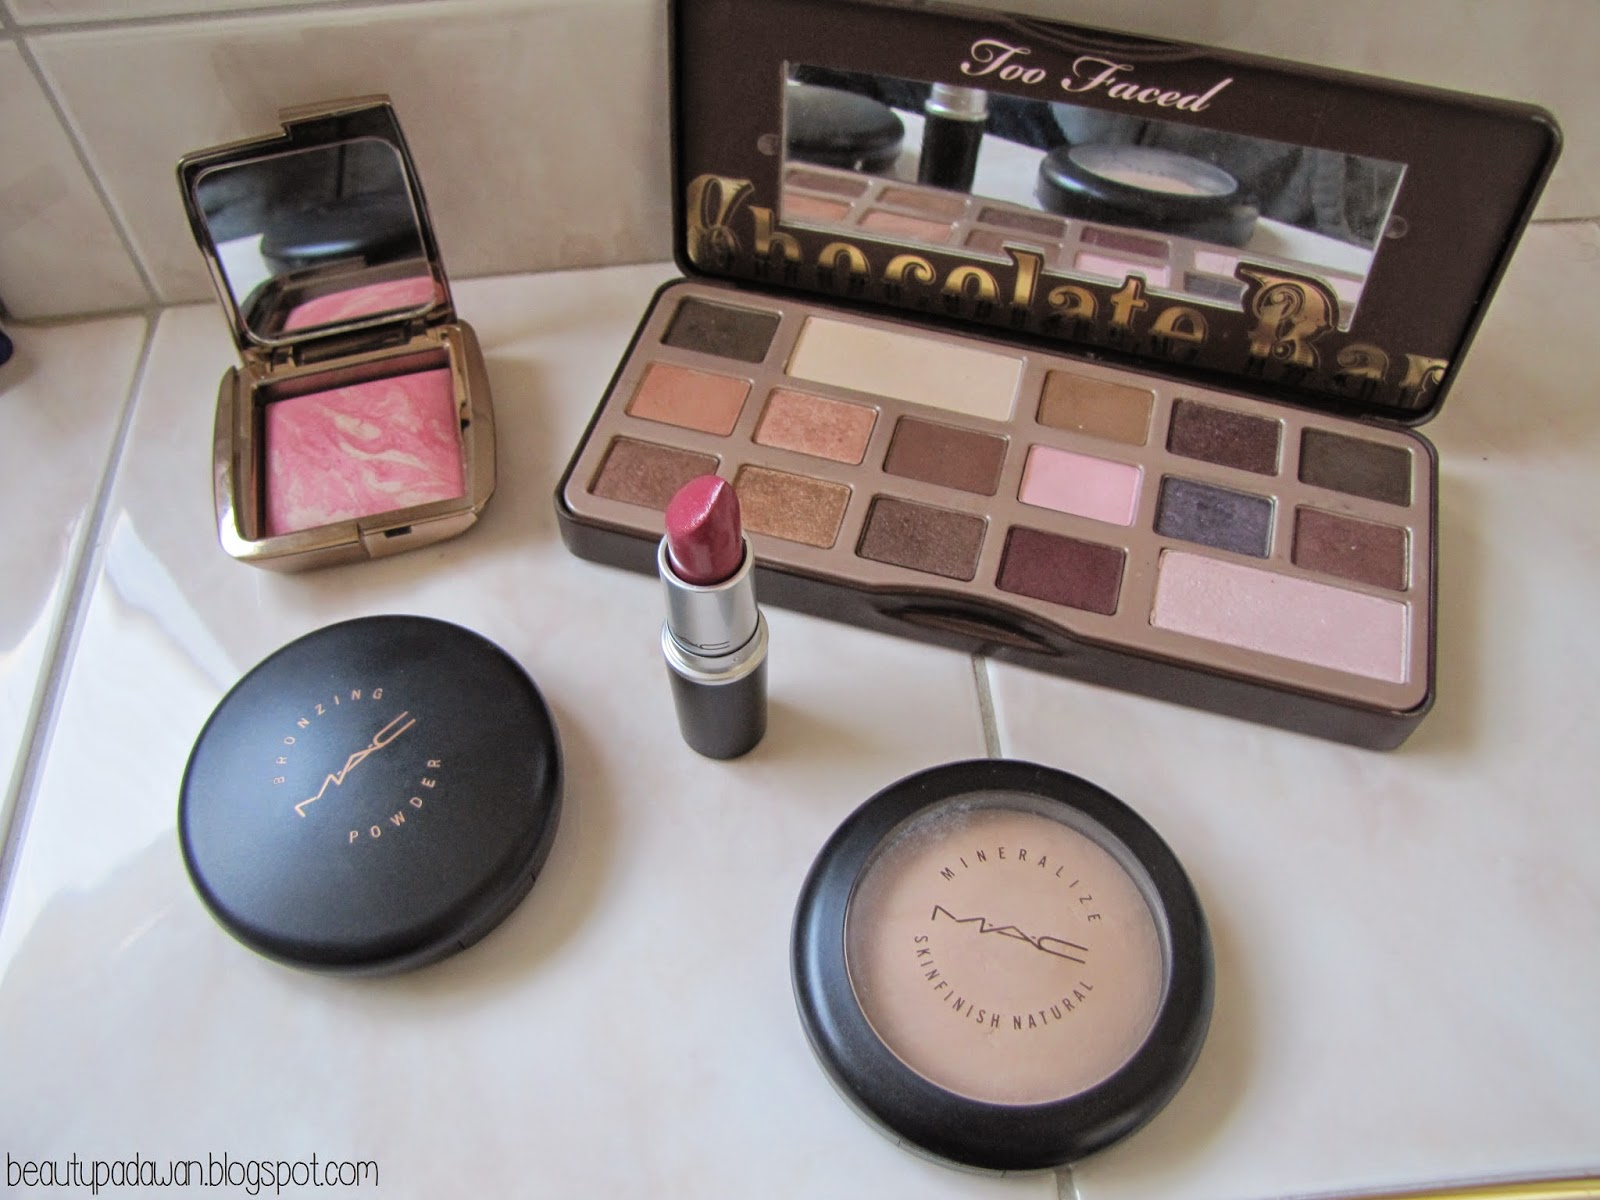 Too Faced Chocolate Bar Palette; Hourglass Ambient Lighting Blush; MAC Bronzing Powder; MAC Novel Romance Lipstick - Yield to Love; MAC Mineralize SkinFinish